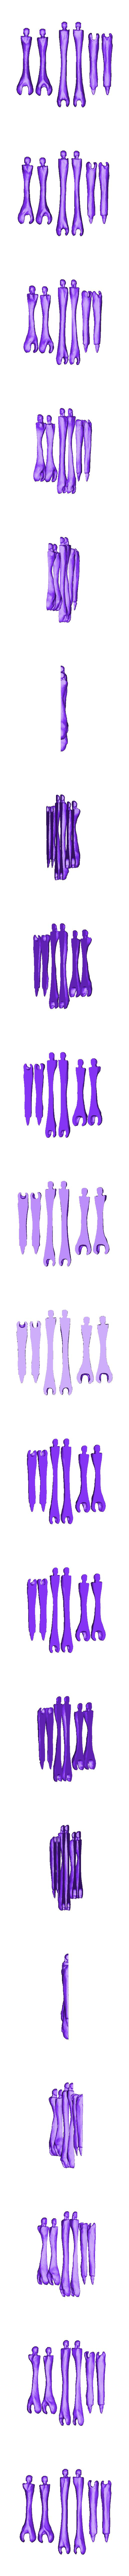 OneLeg_PLA.stl Download free STL file Agisis Ultimate Alien Face Hugger (40in x 23in - LIFE SIZE!) • Model to 3D print, Hoofbaugh